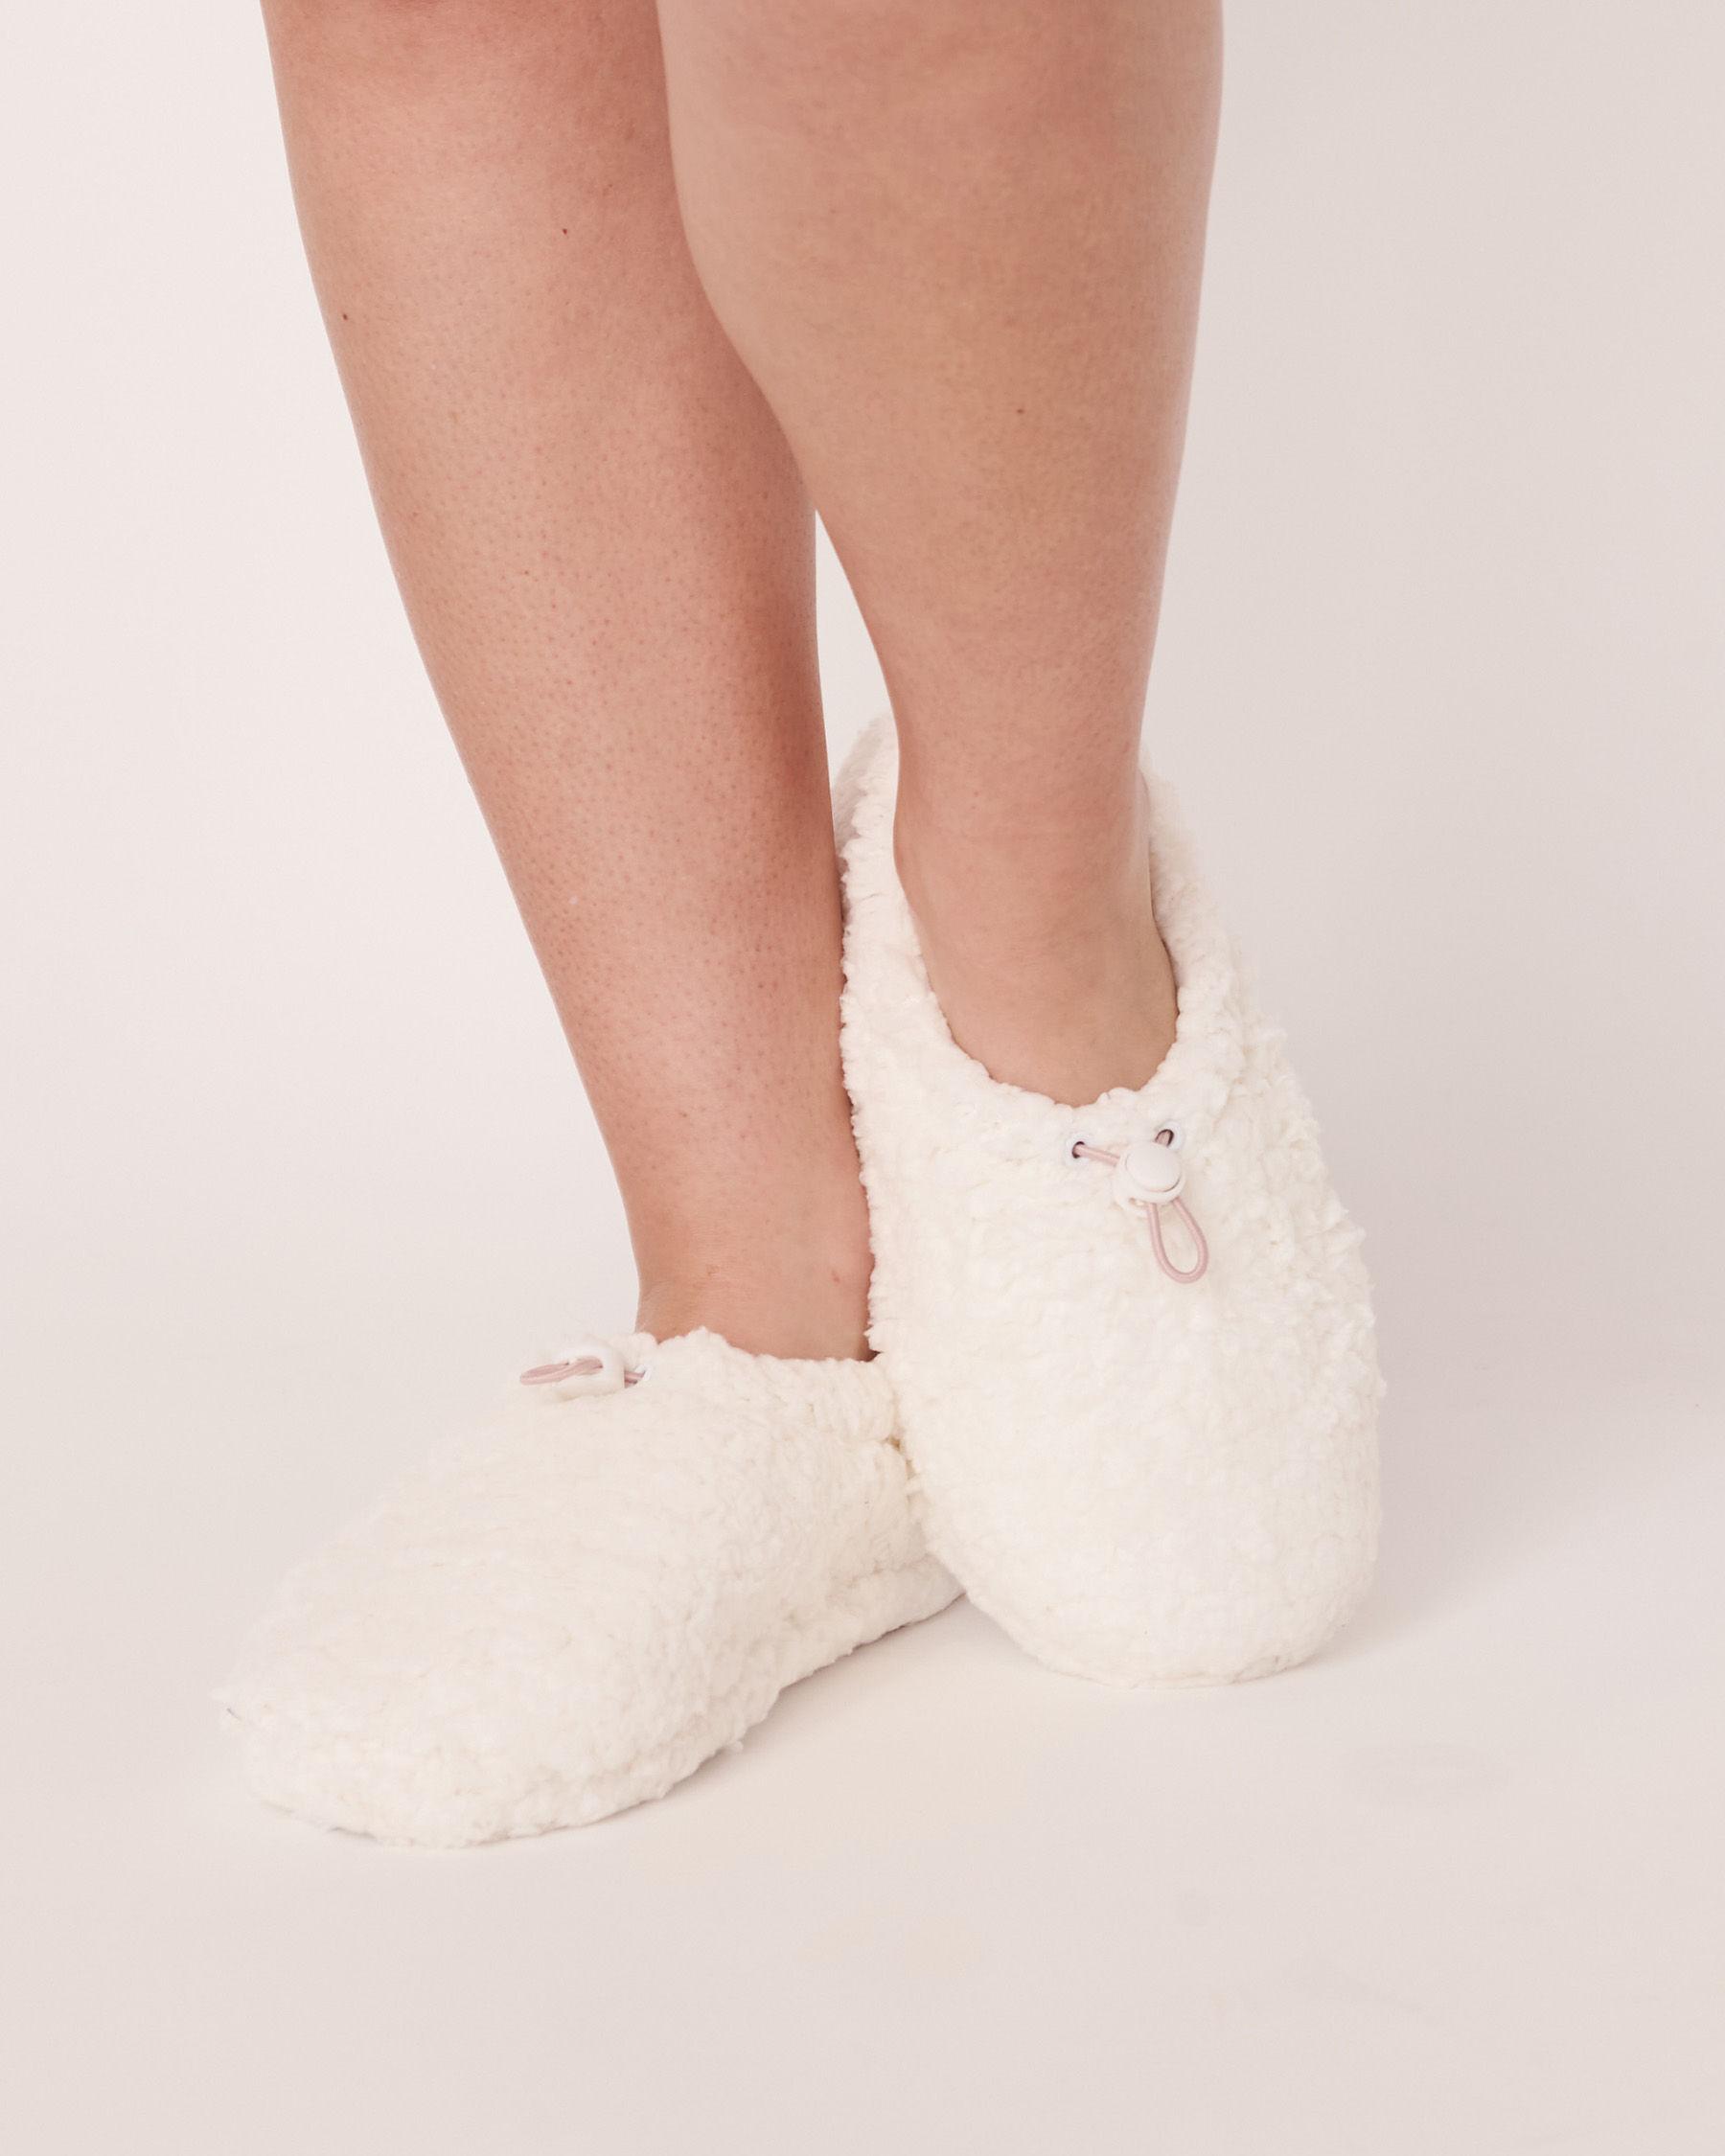 LA VIE EN ROSE Sherpa Bootie Slippers White 40700070 - View3